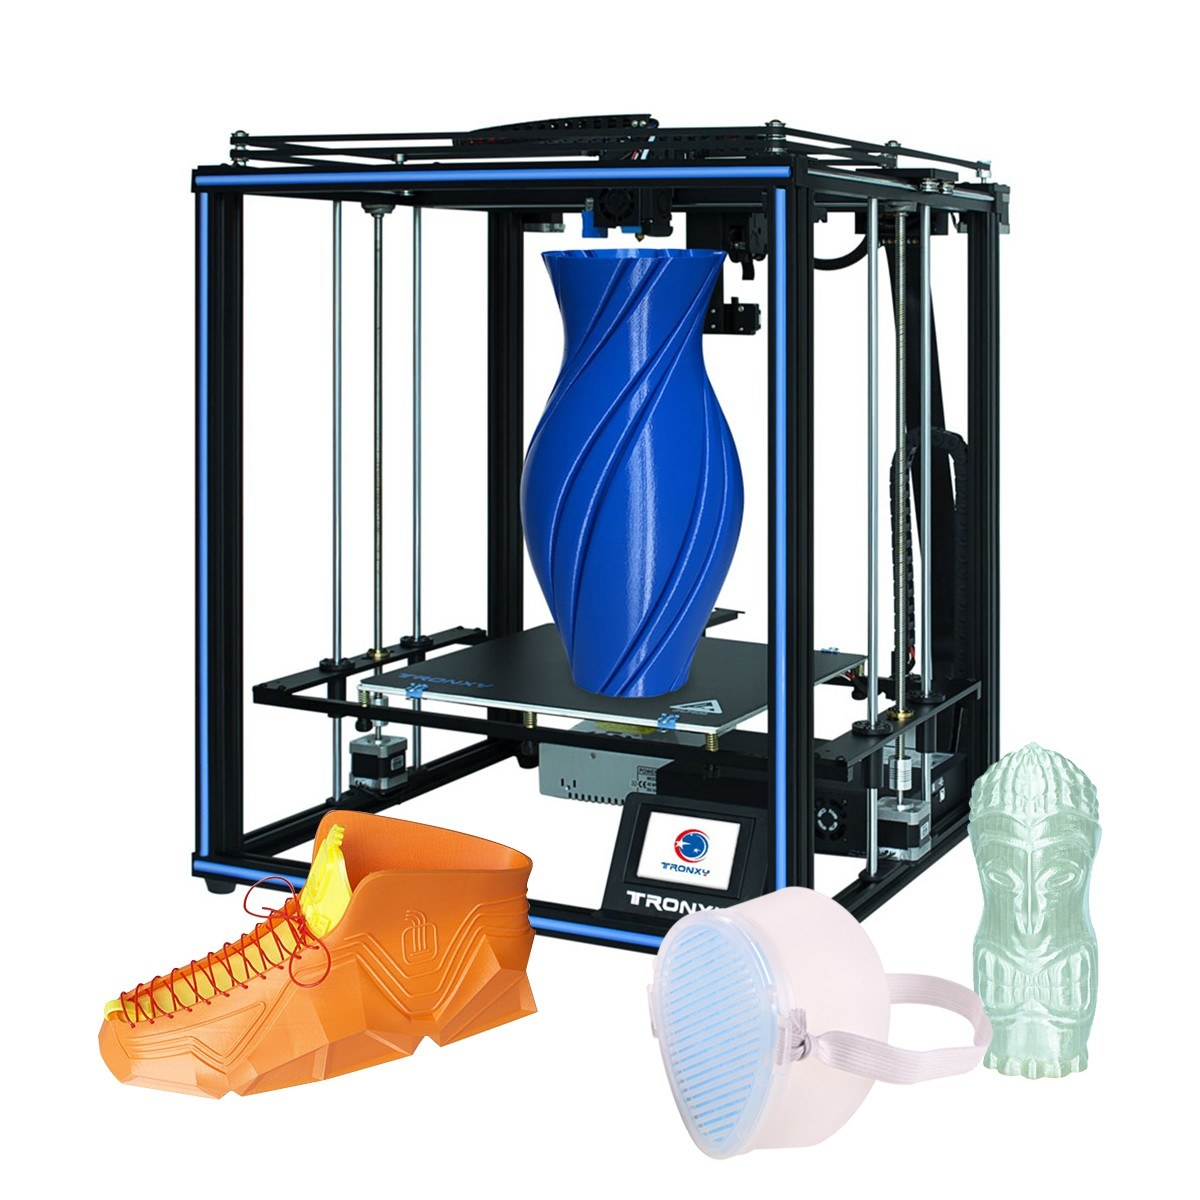 Cafago - 52% OFF Tronxy X5SA-400PRO High Precision 3D Printer,free shipping+$566.89